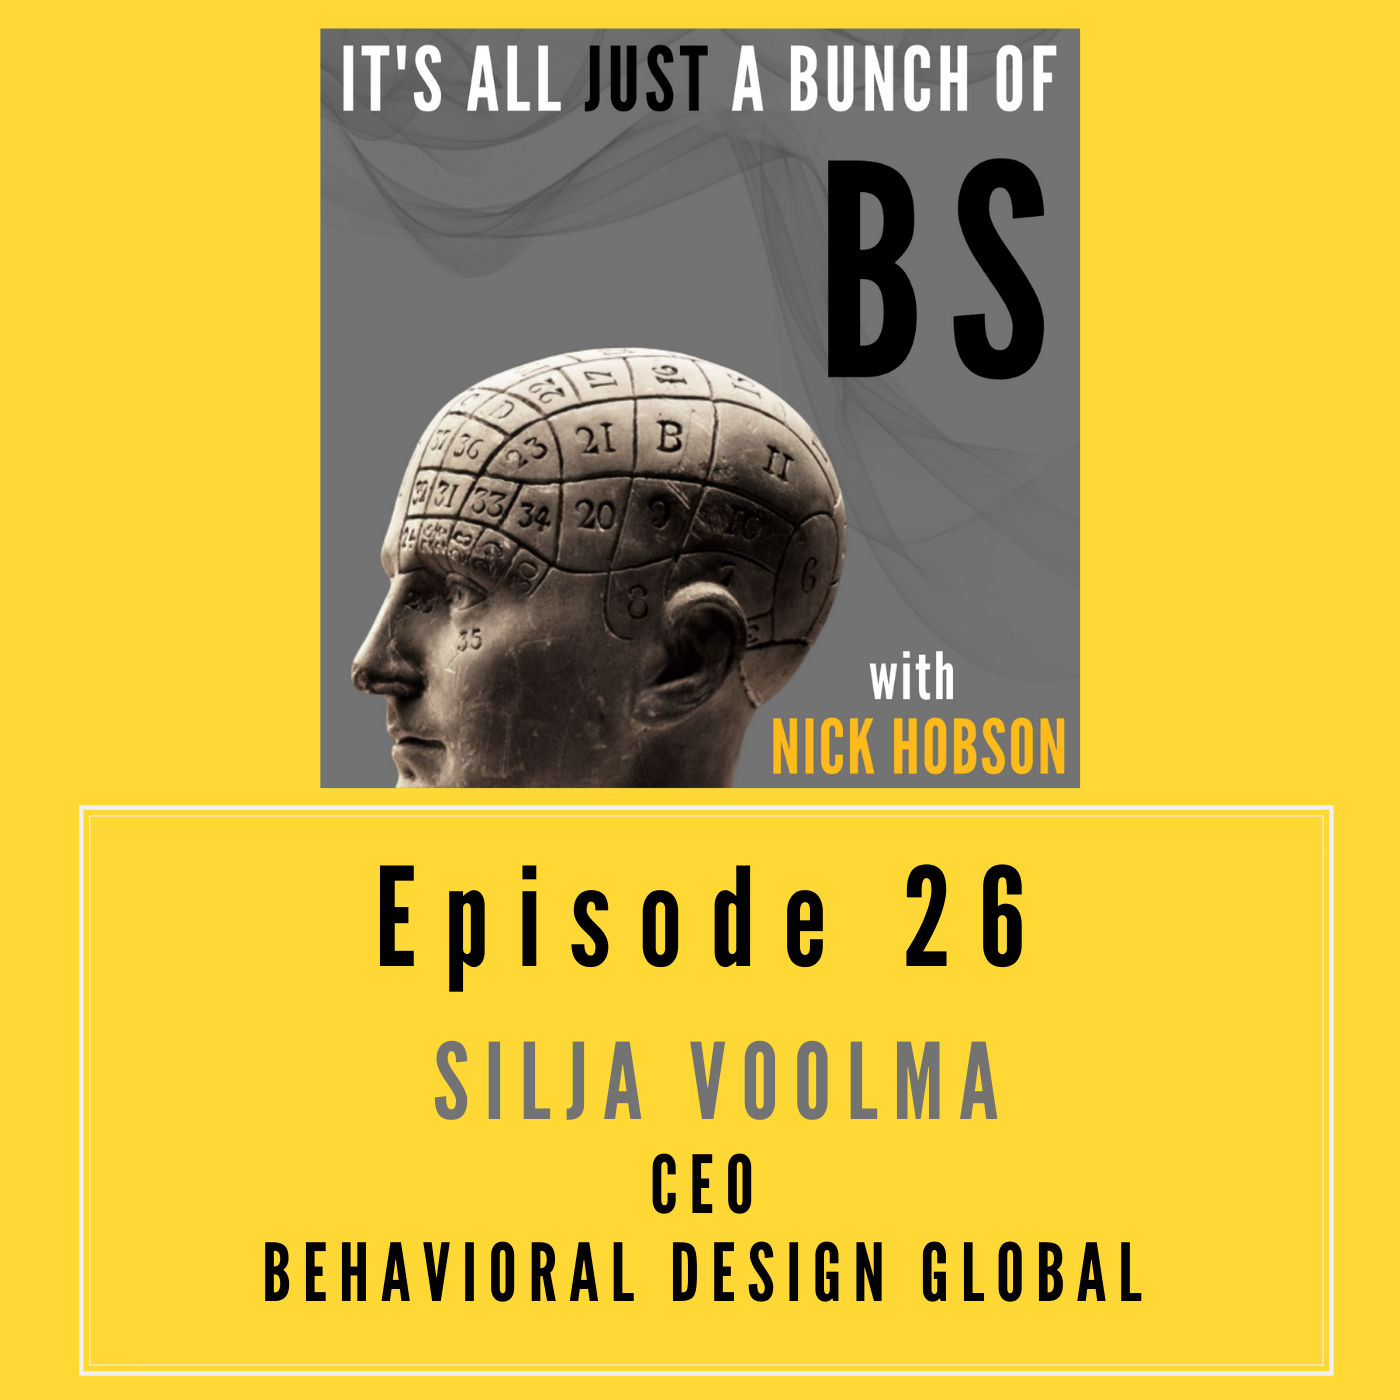 Episode 26 with SILJA VOOLMA: Bringing the Body Back into Behavior Change